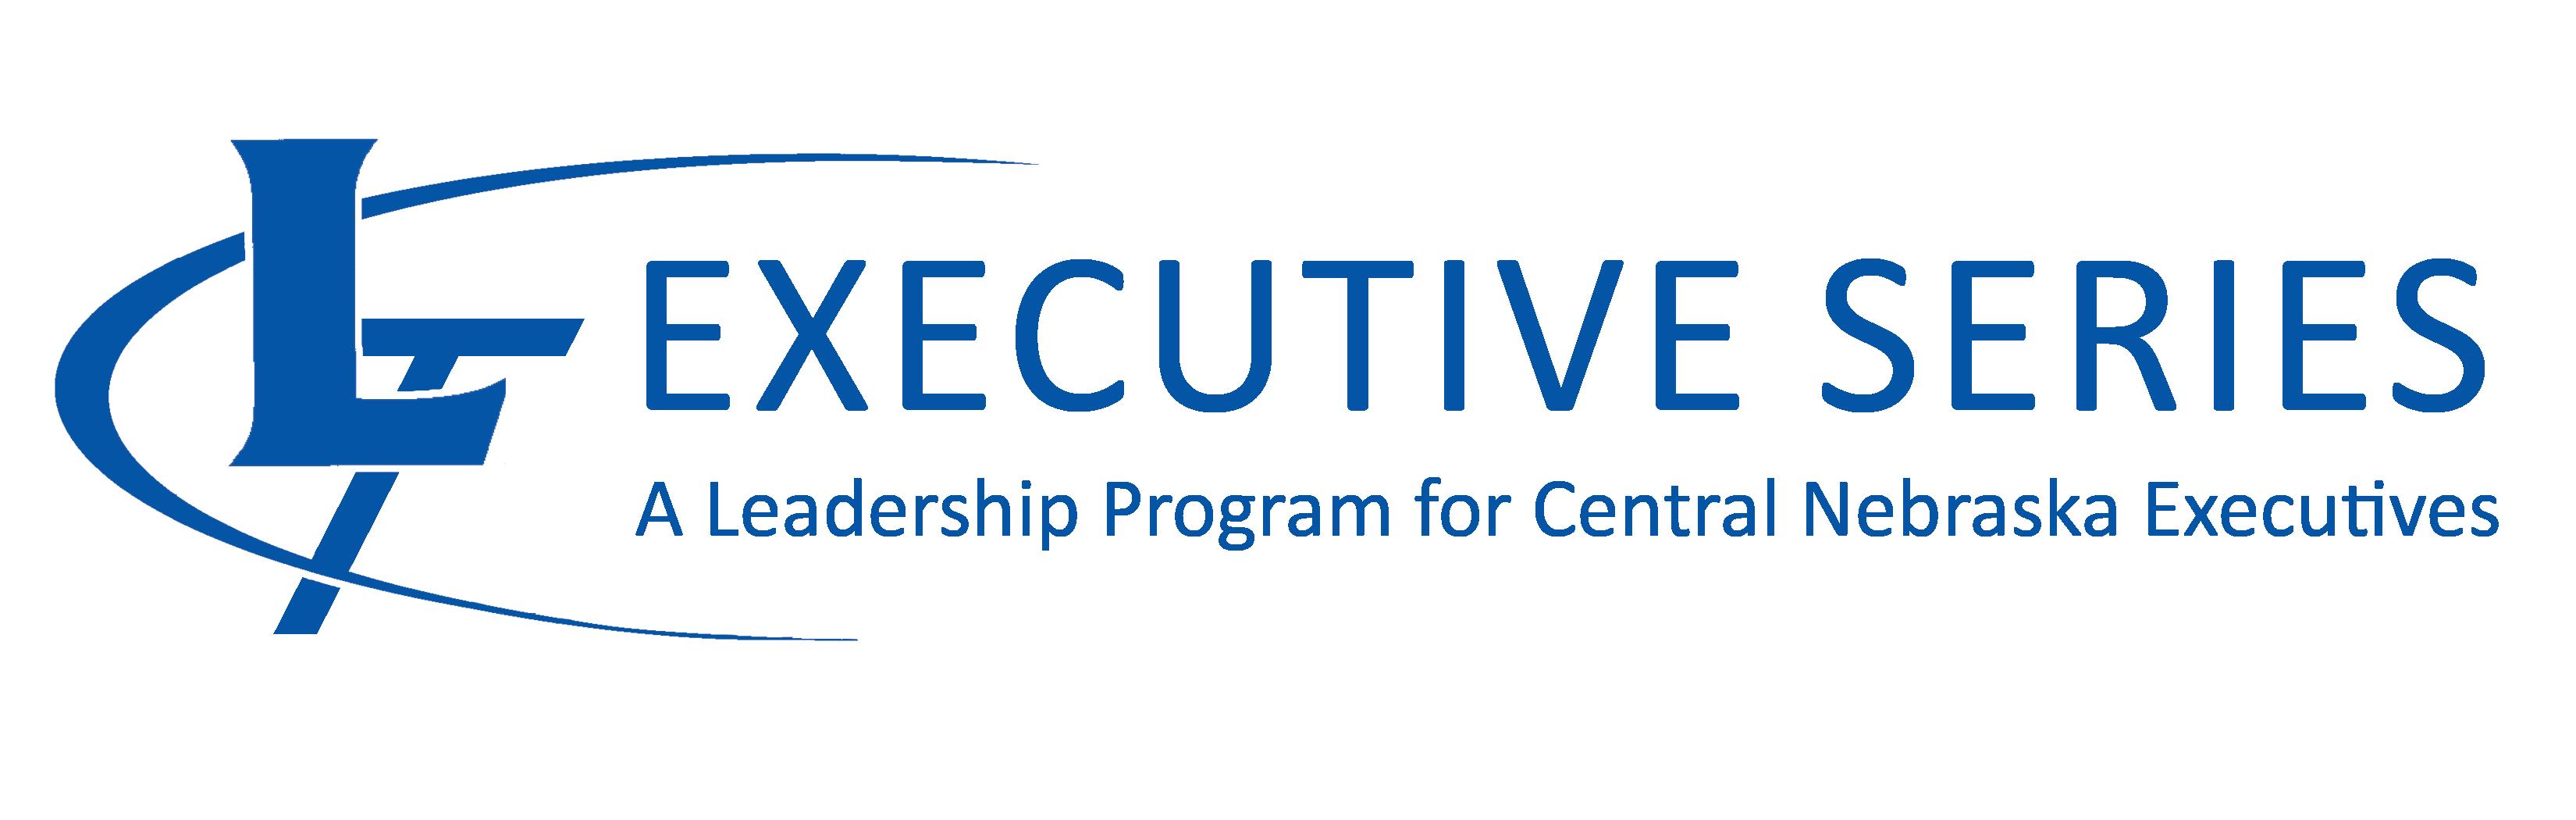 LT Executive Series: Crafting Culture